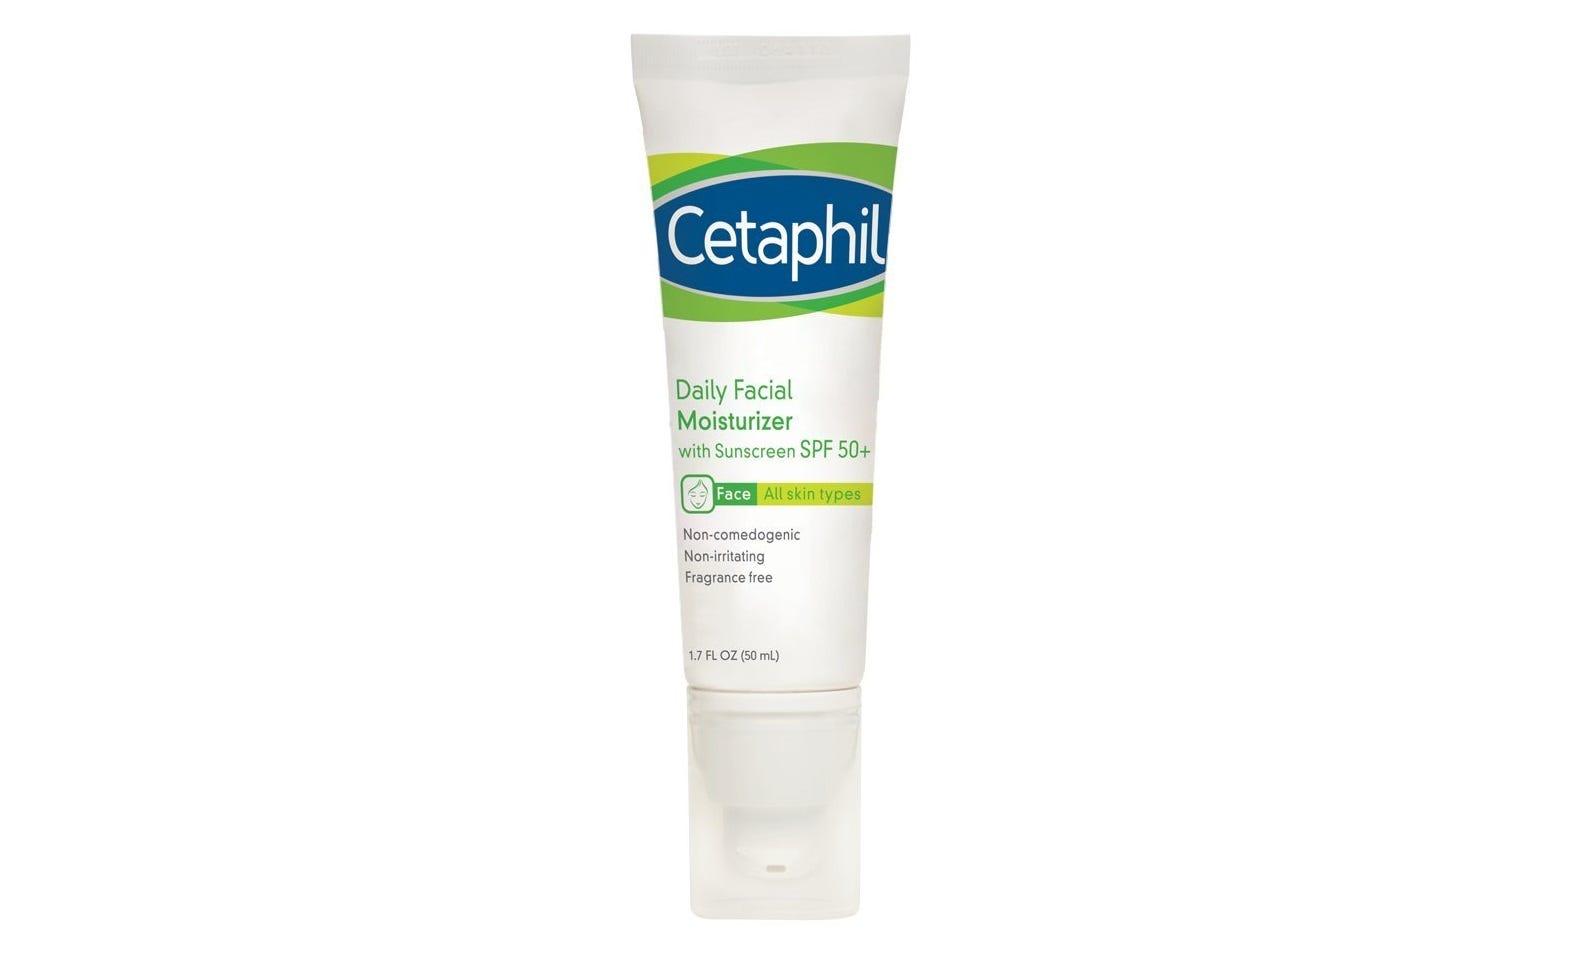 Cetaphil Facial Moisturizer